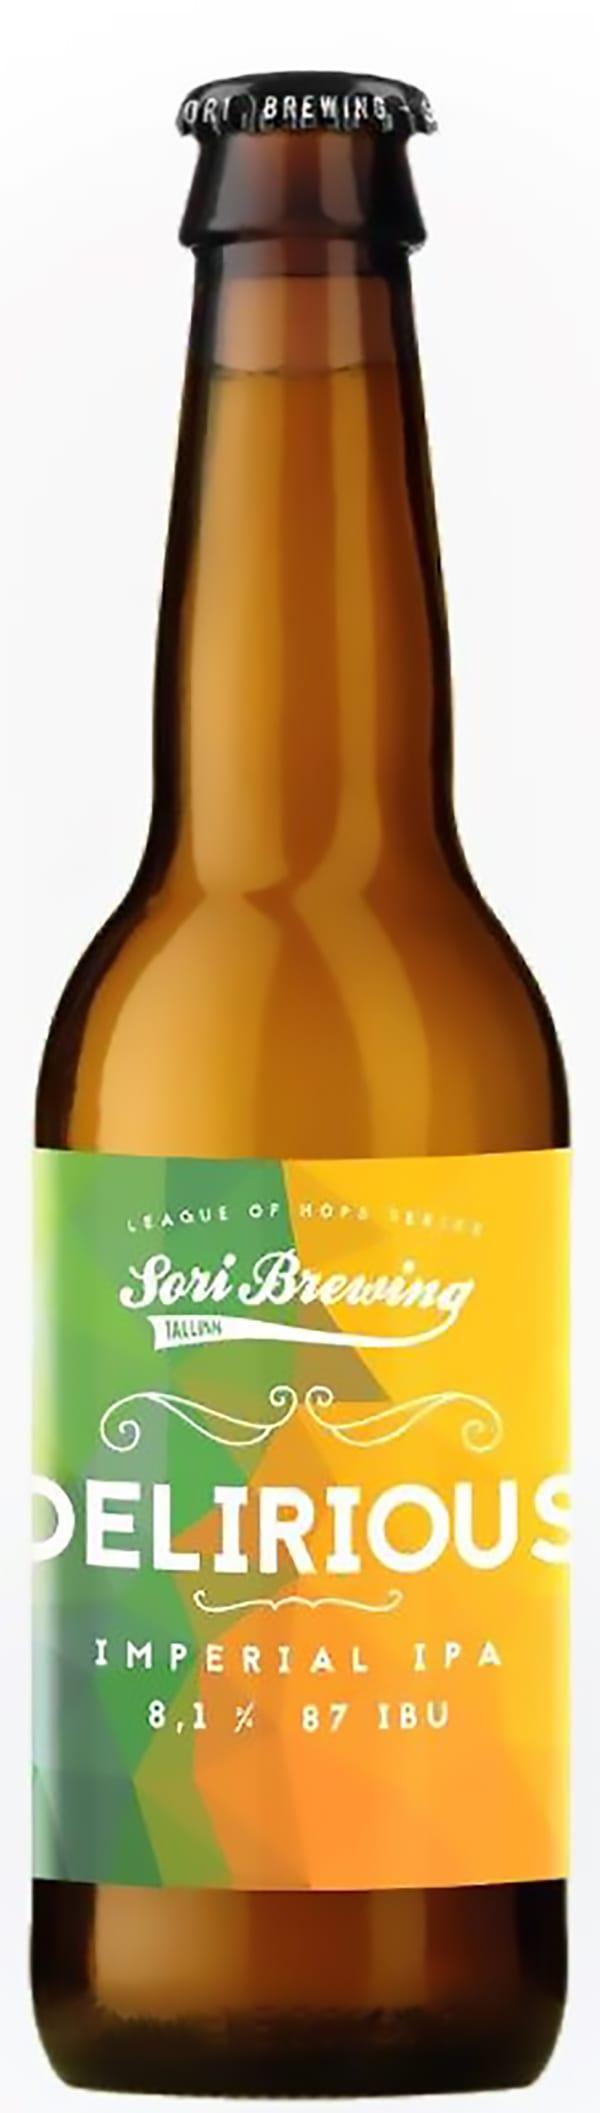 Sori Brewing Delirious Imperial IPA